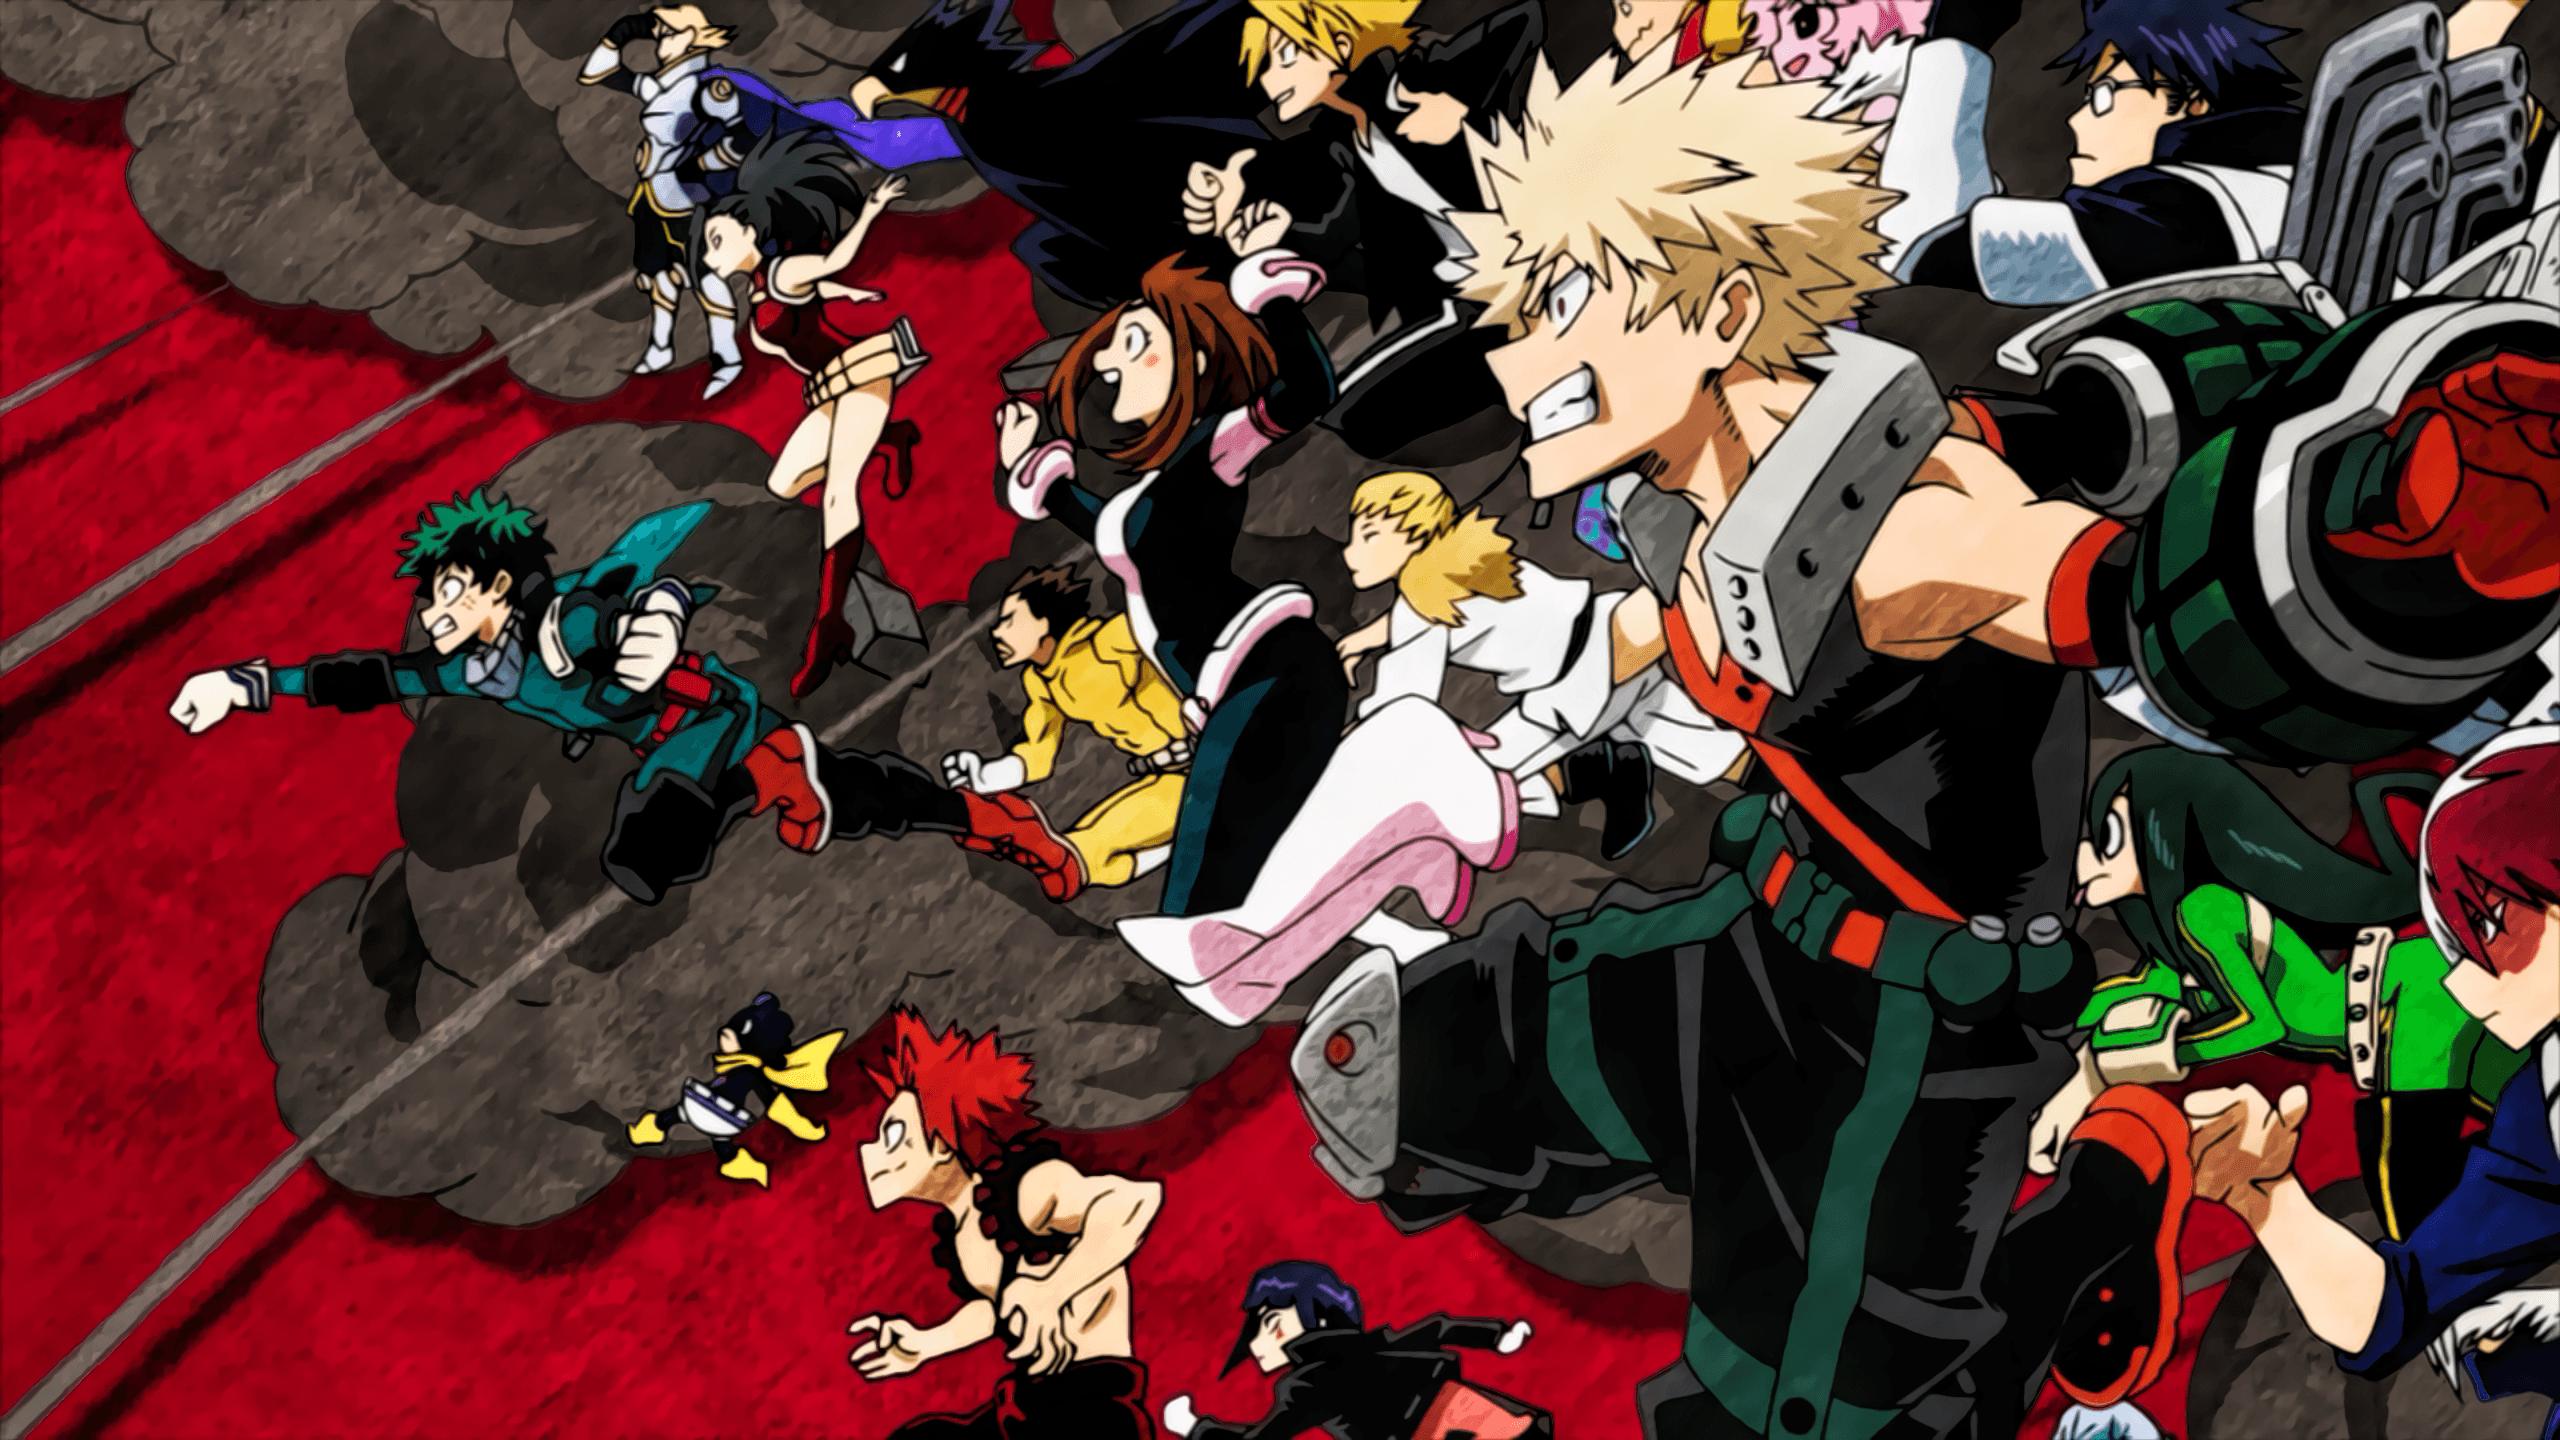 Anime Ps4 MHA Wallpapers 2560x1440